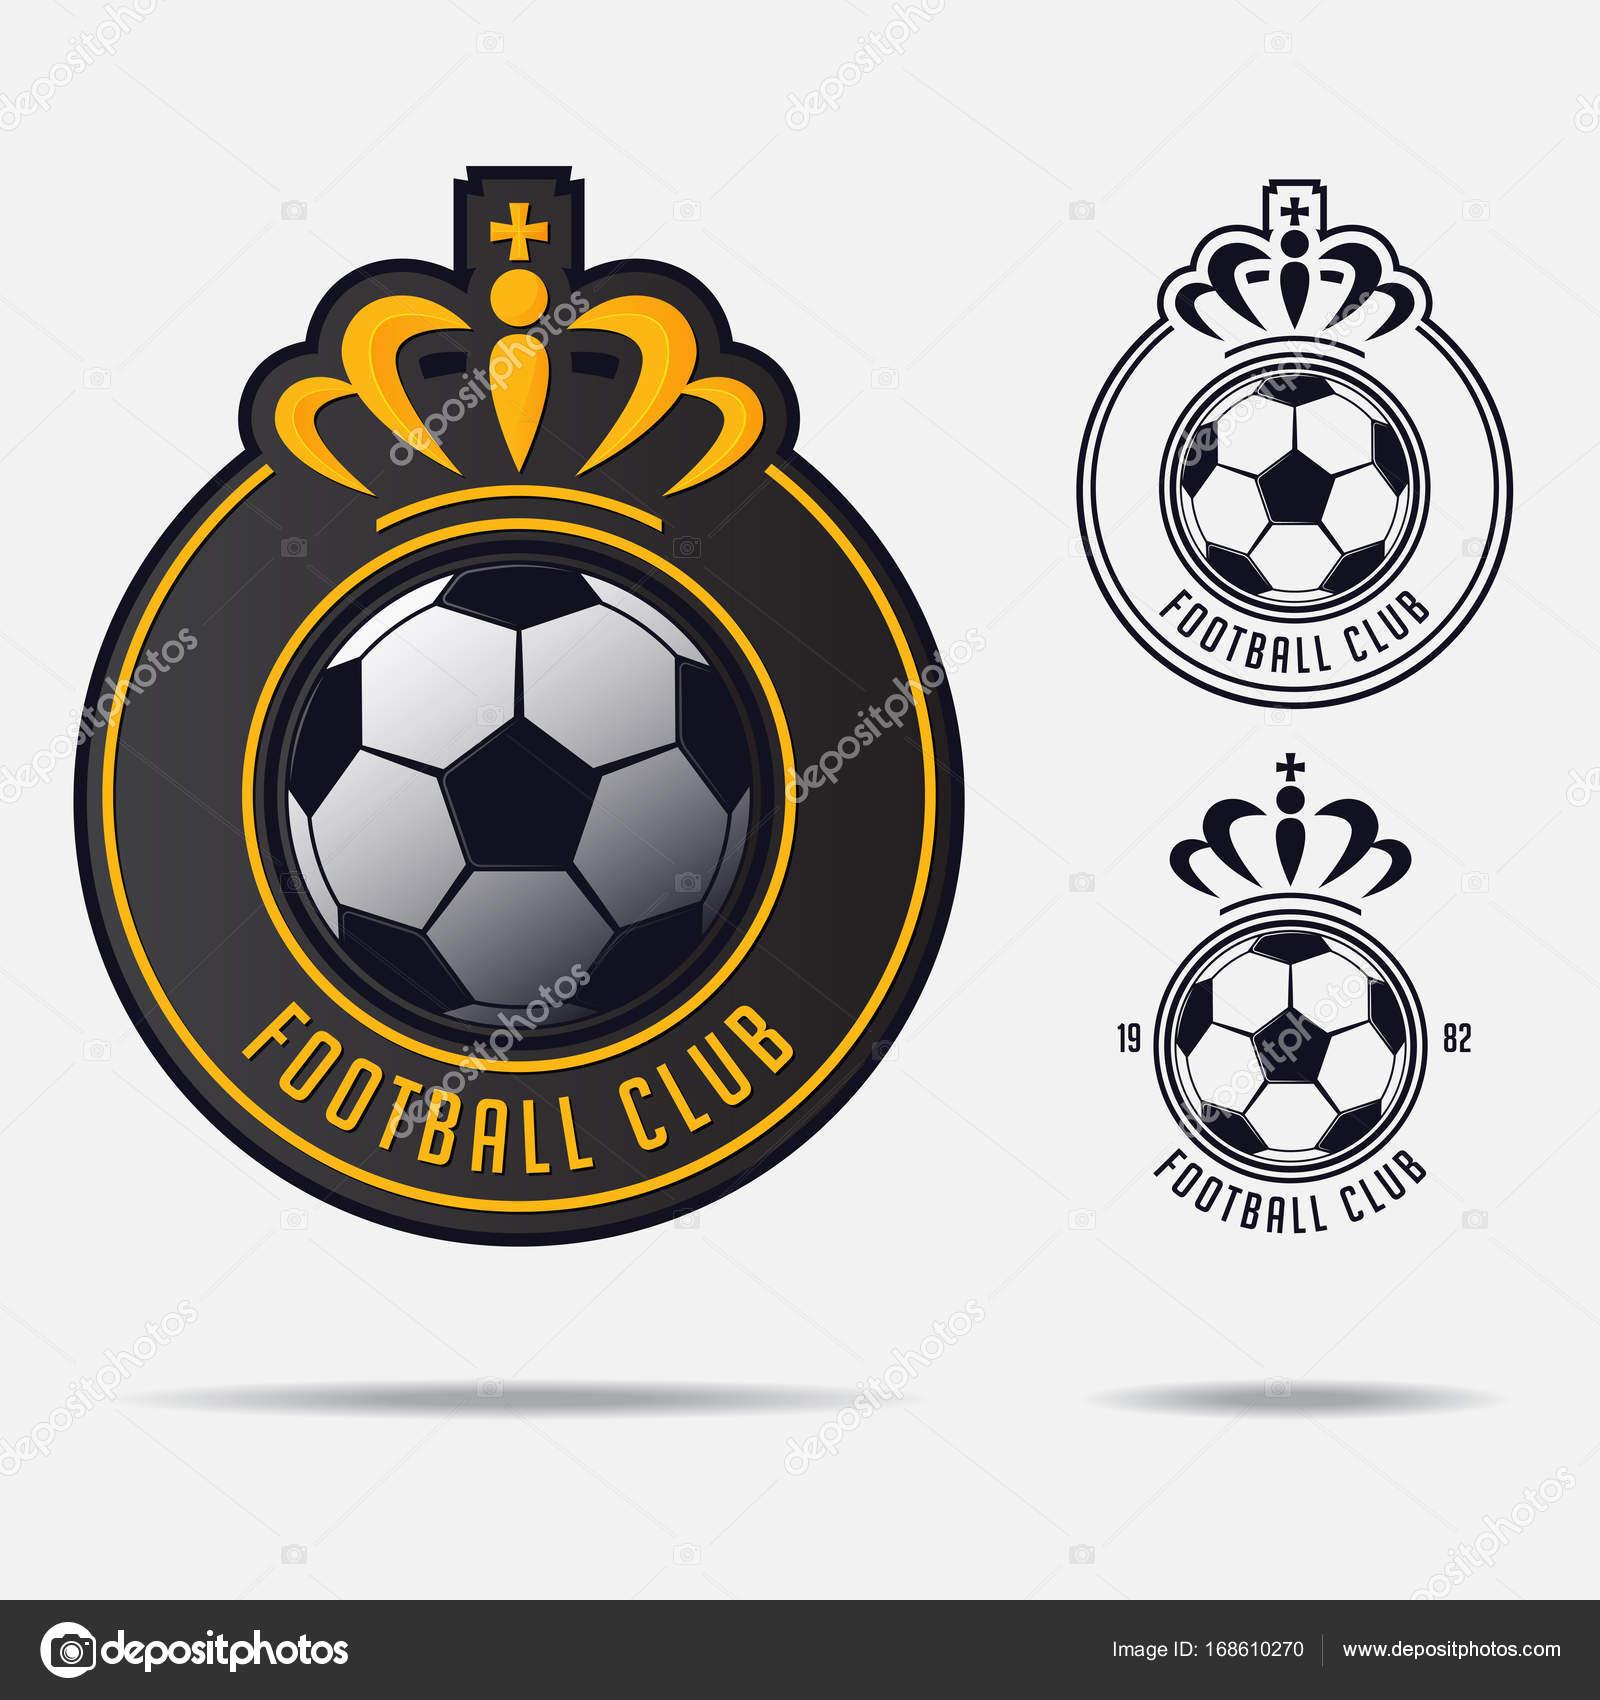 Soccer emblem or football badge logo design for football team soccer emblem or football badge logo design for football team minimal design of golden crown buycottarizona